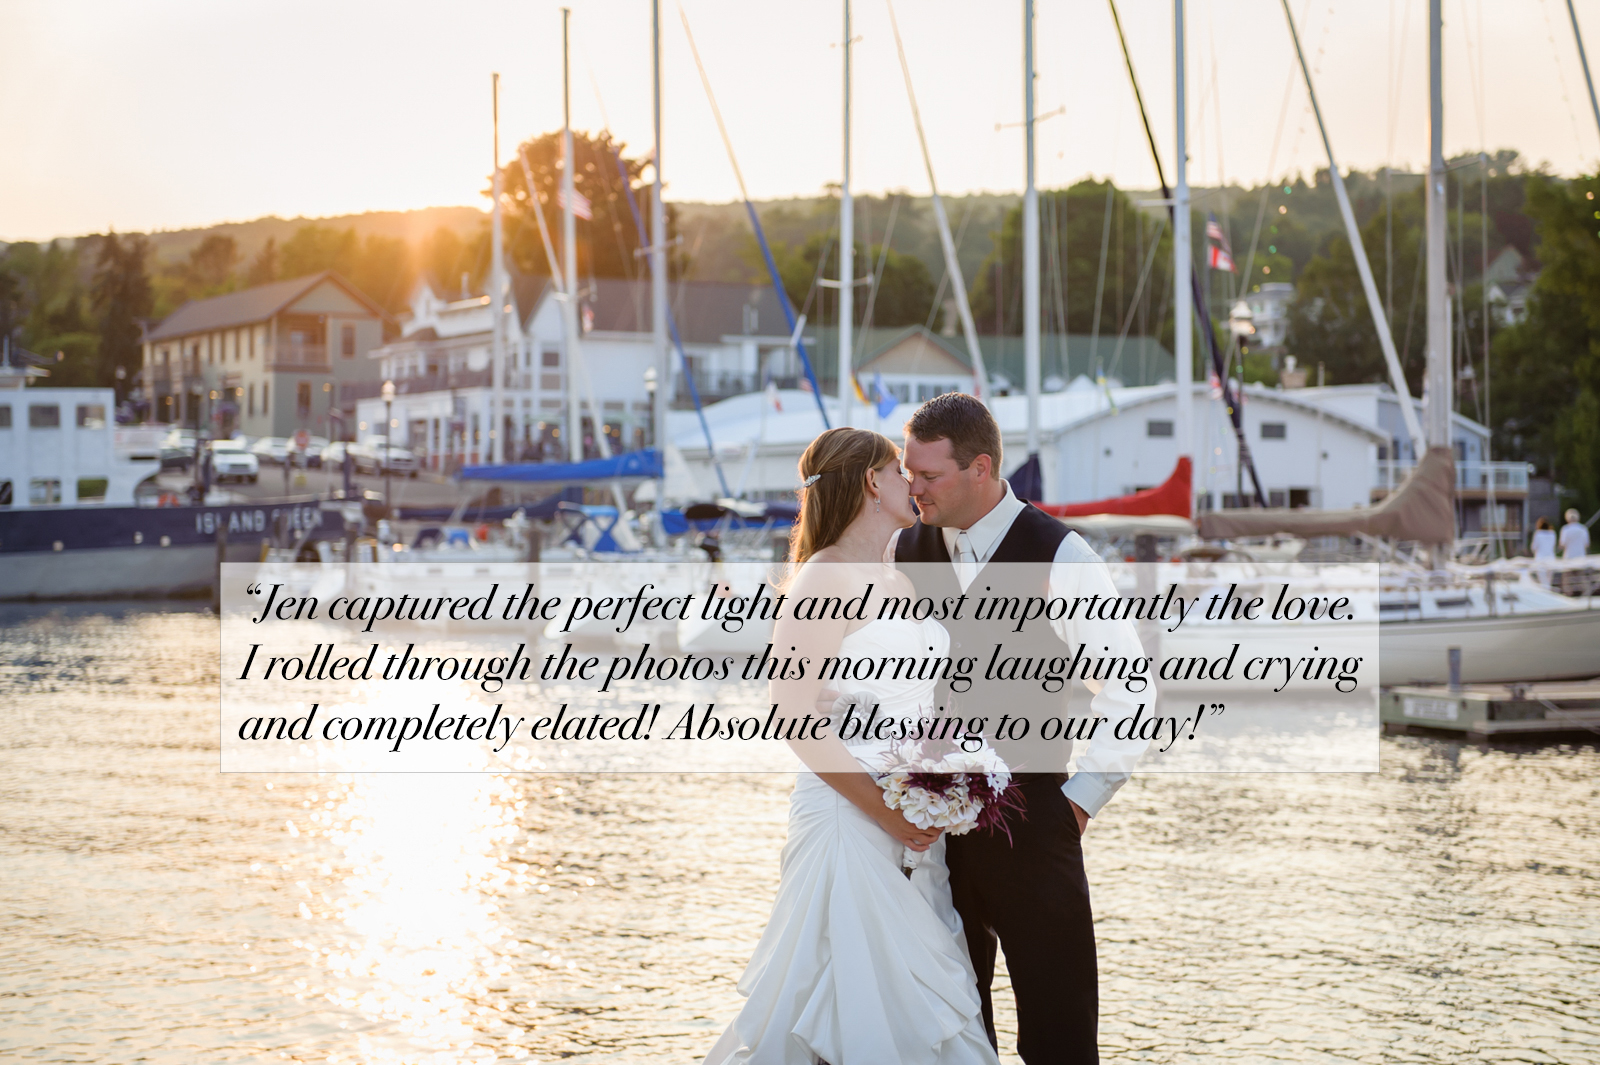 apostle highlands bayfield wedding photographer ps 139-0457.jpg